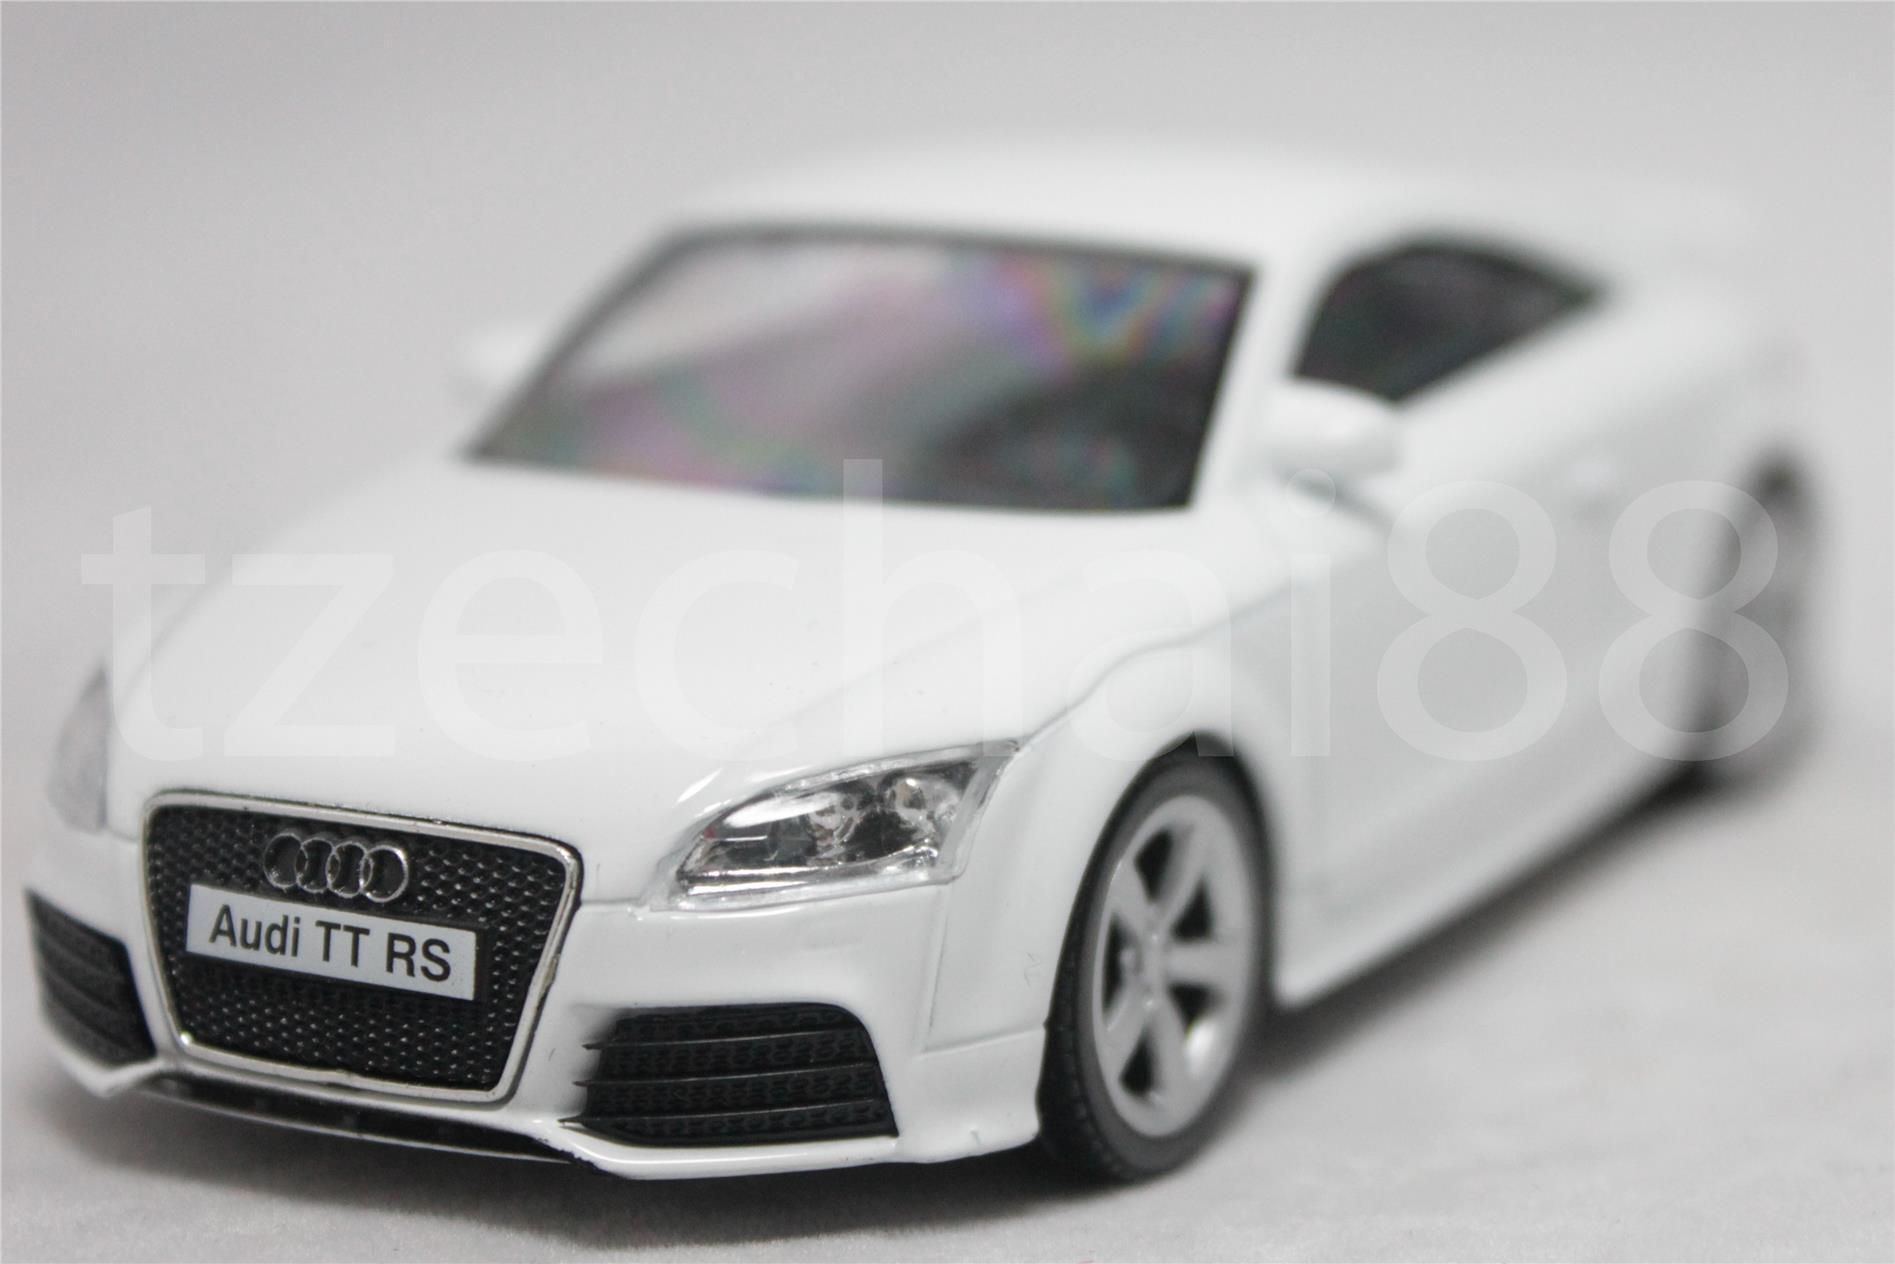 Rmz city diecast 1 43 audi tt coupe car white color collection new toy